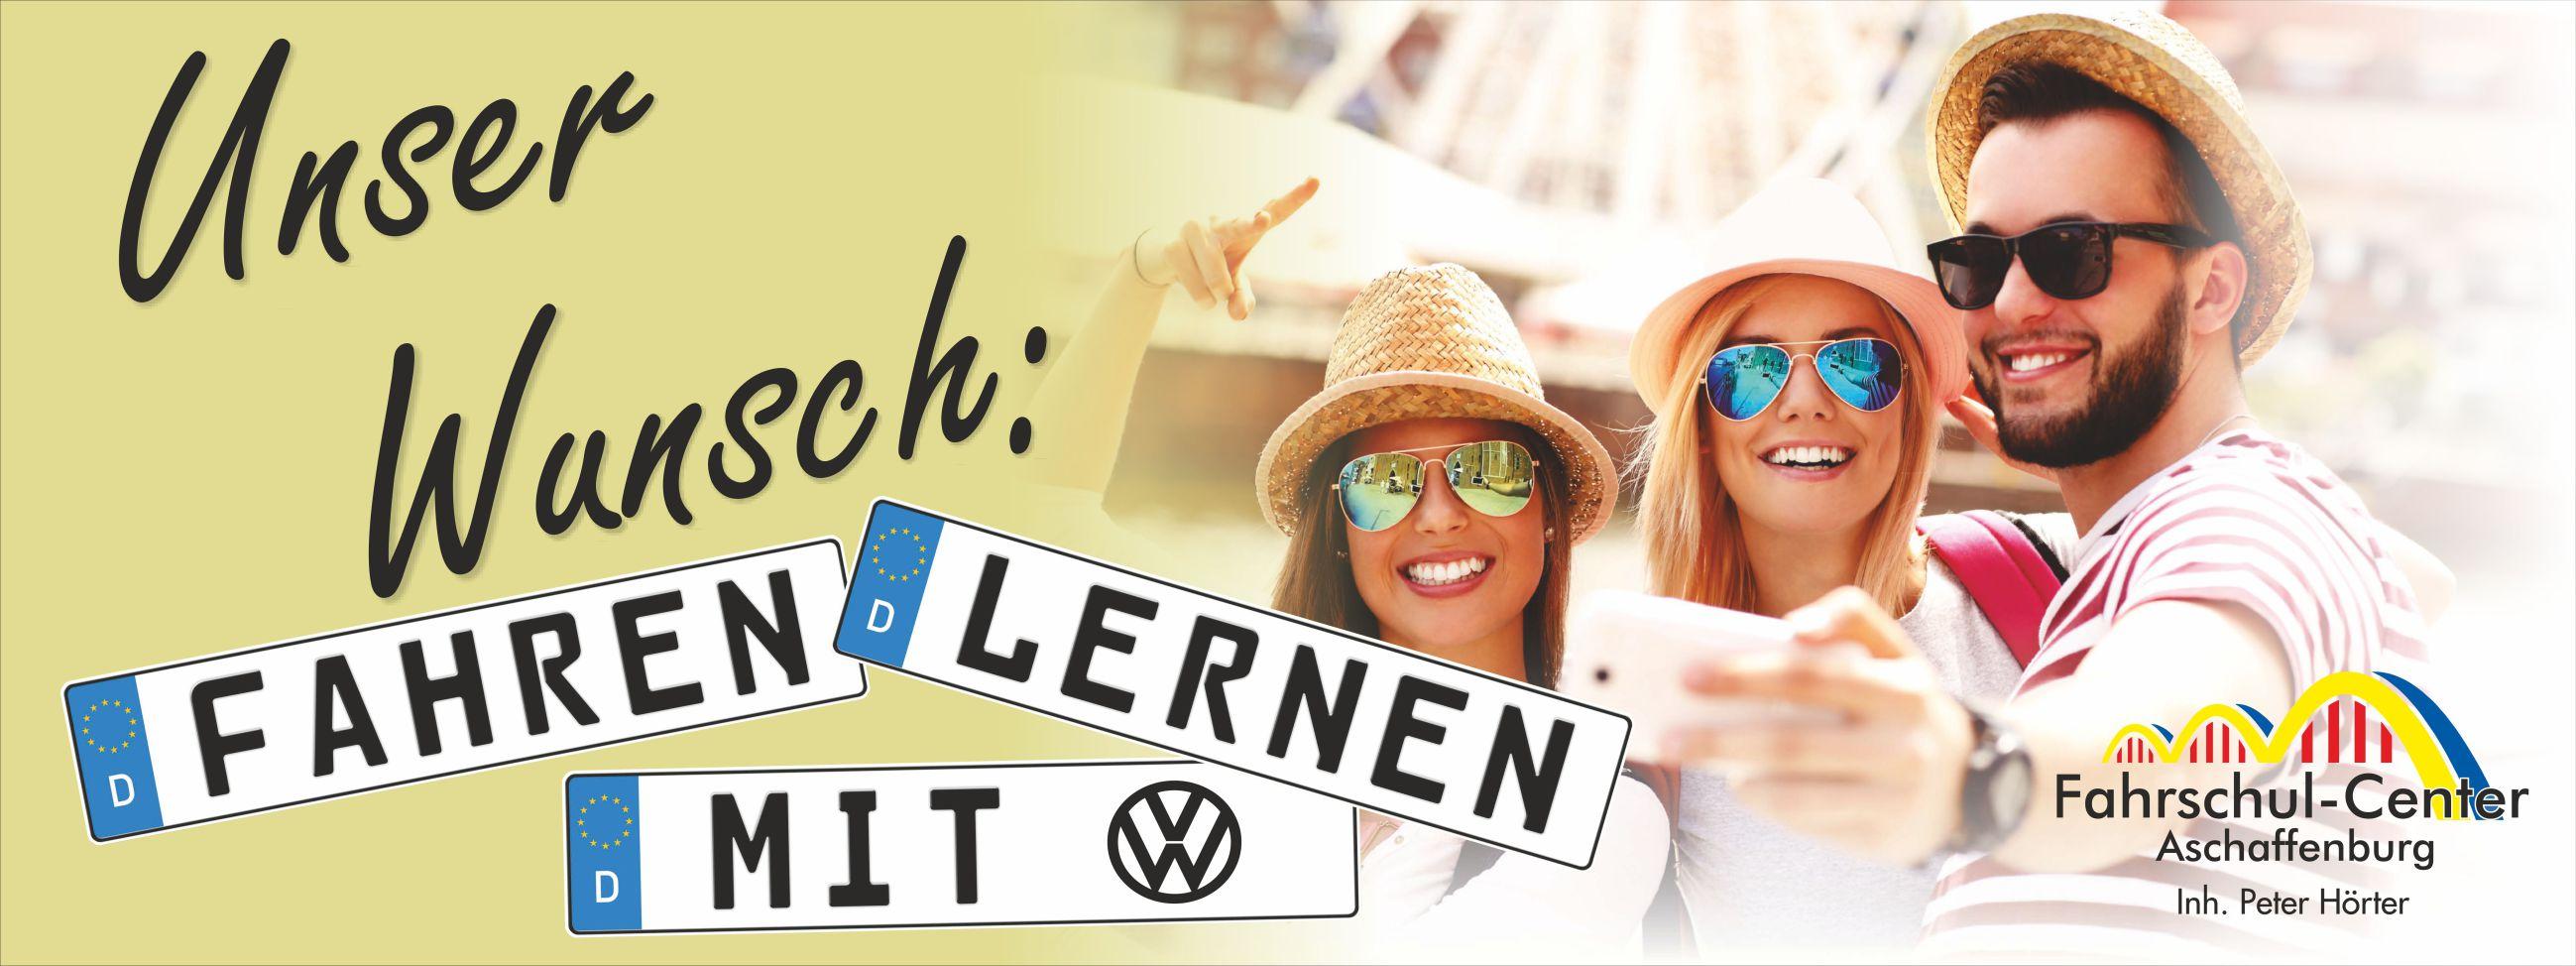 Fahrschule-Innenstadt-Aschaffenburg, Fahrschule-Stadtmitte, Fahren-Lernen, Intensivkurs-Ferienkurs-Schnellkurs, 7-Tage-zum-Führerschein, gute-günstige-Fahrschule